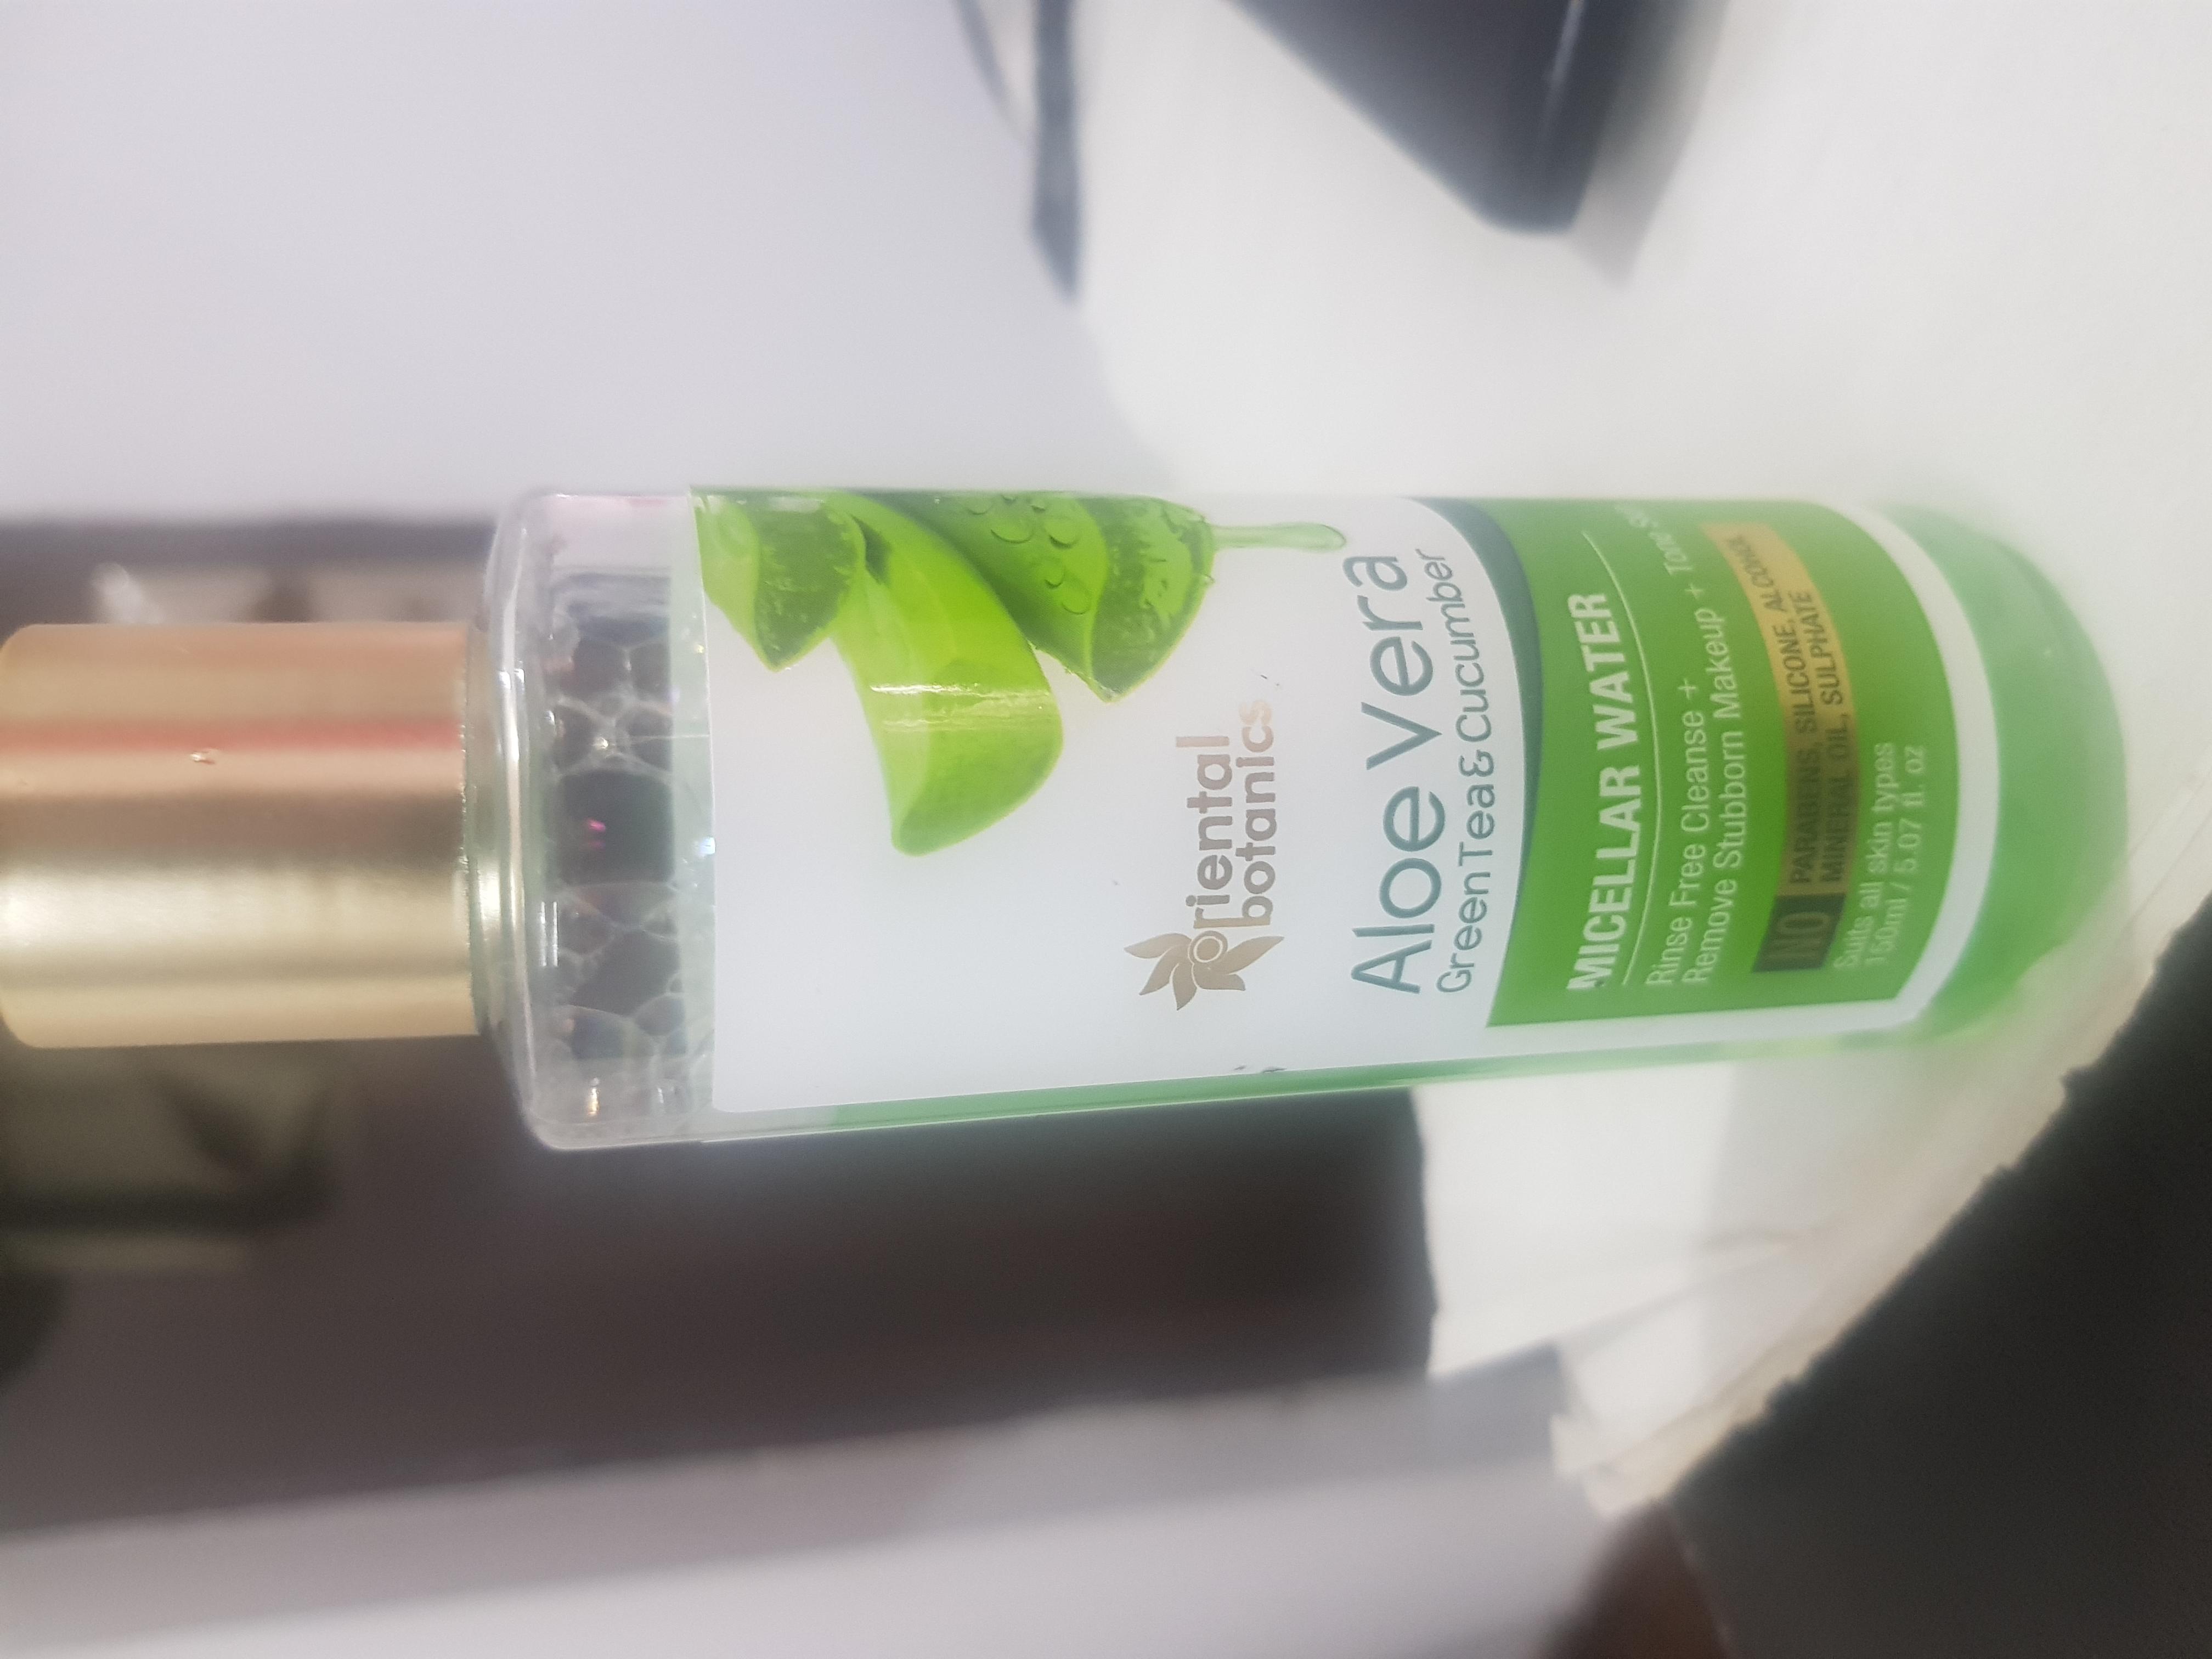 Oriental Botanics Aloe Vera, Green Tea & Cucumber Micellar Water-A holy grail for everyday makeup users!-By vasundhra_khatter-2